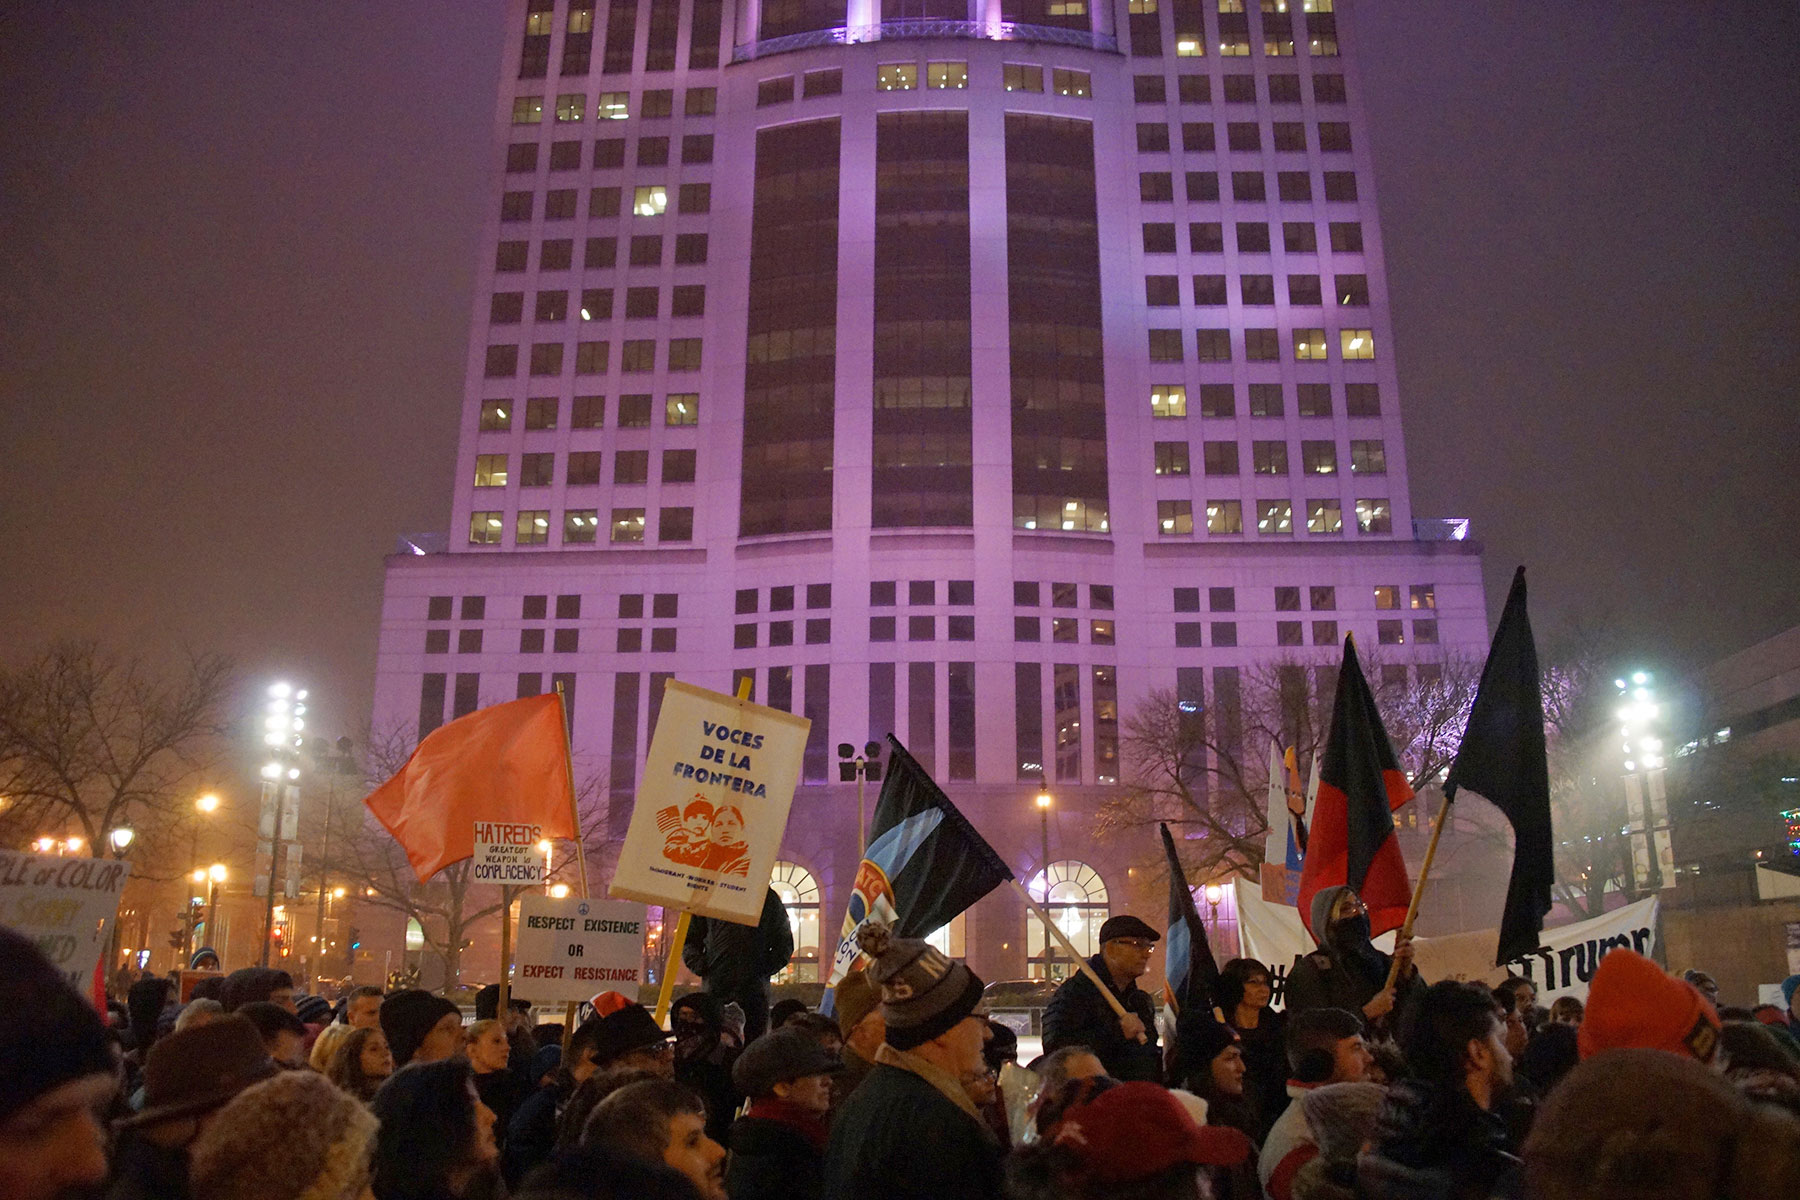 012017_inaugurationprotest_1061p